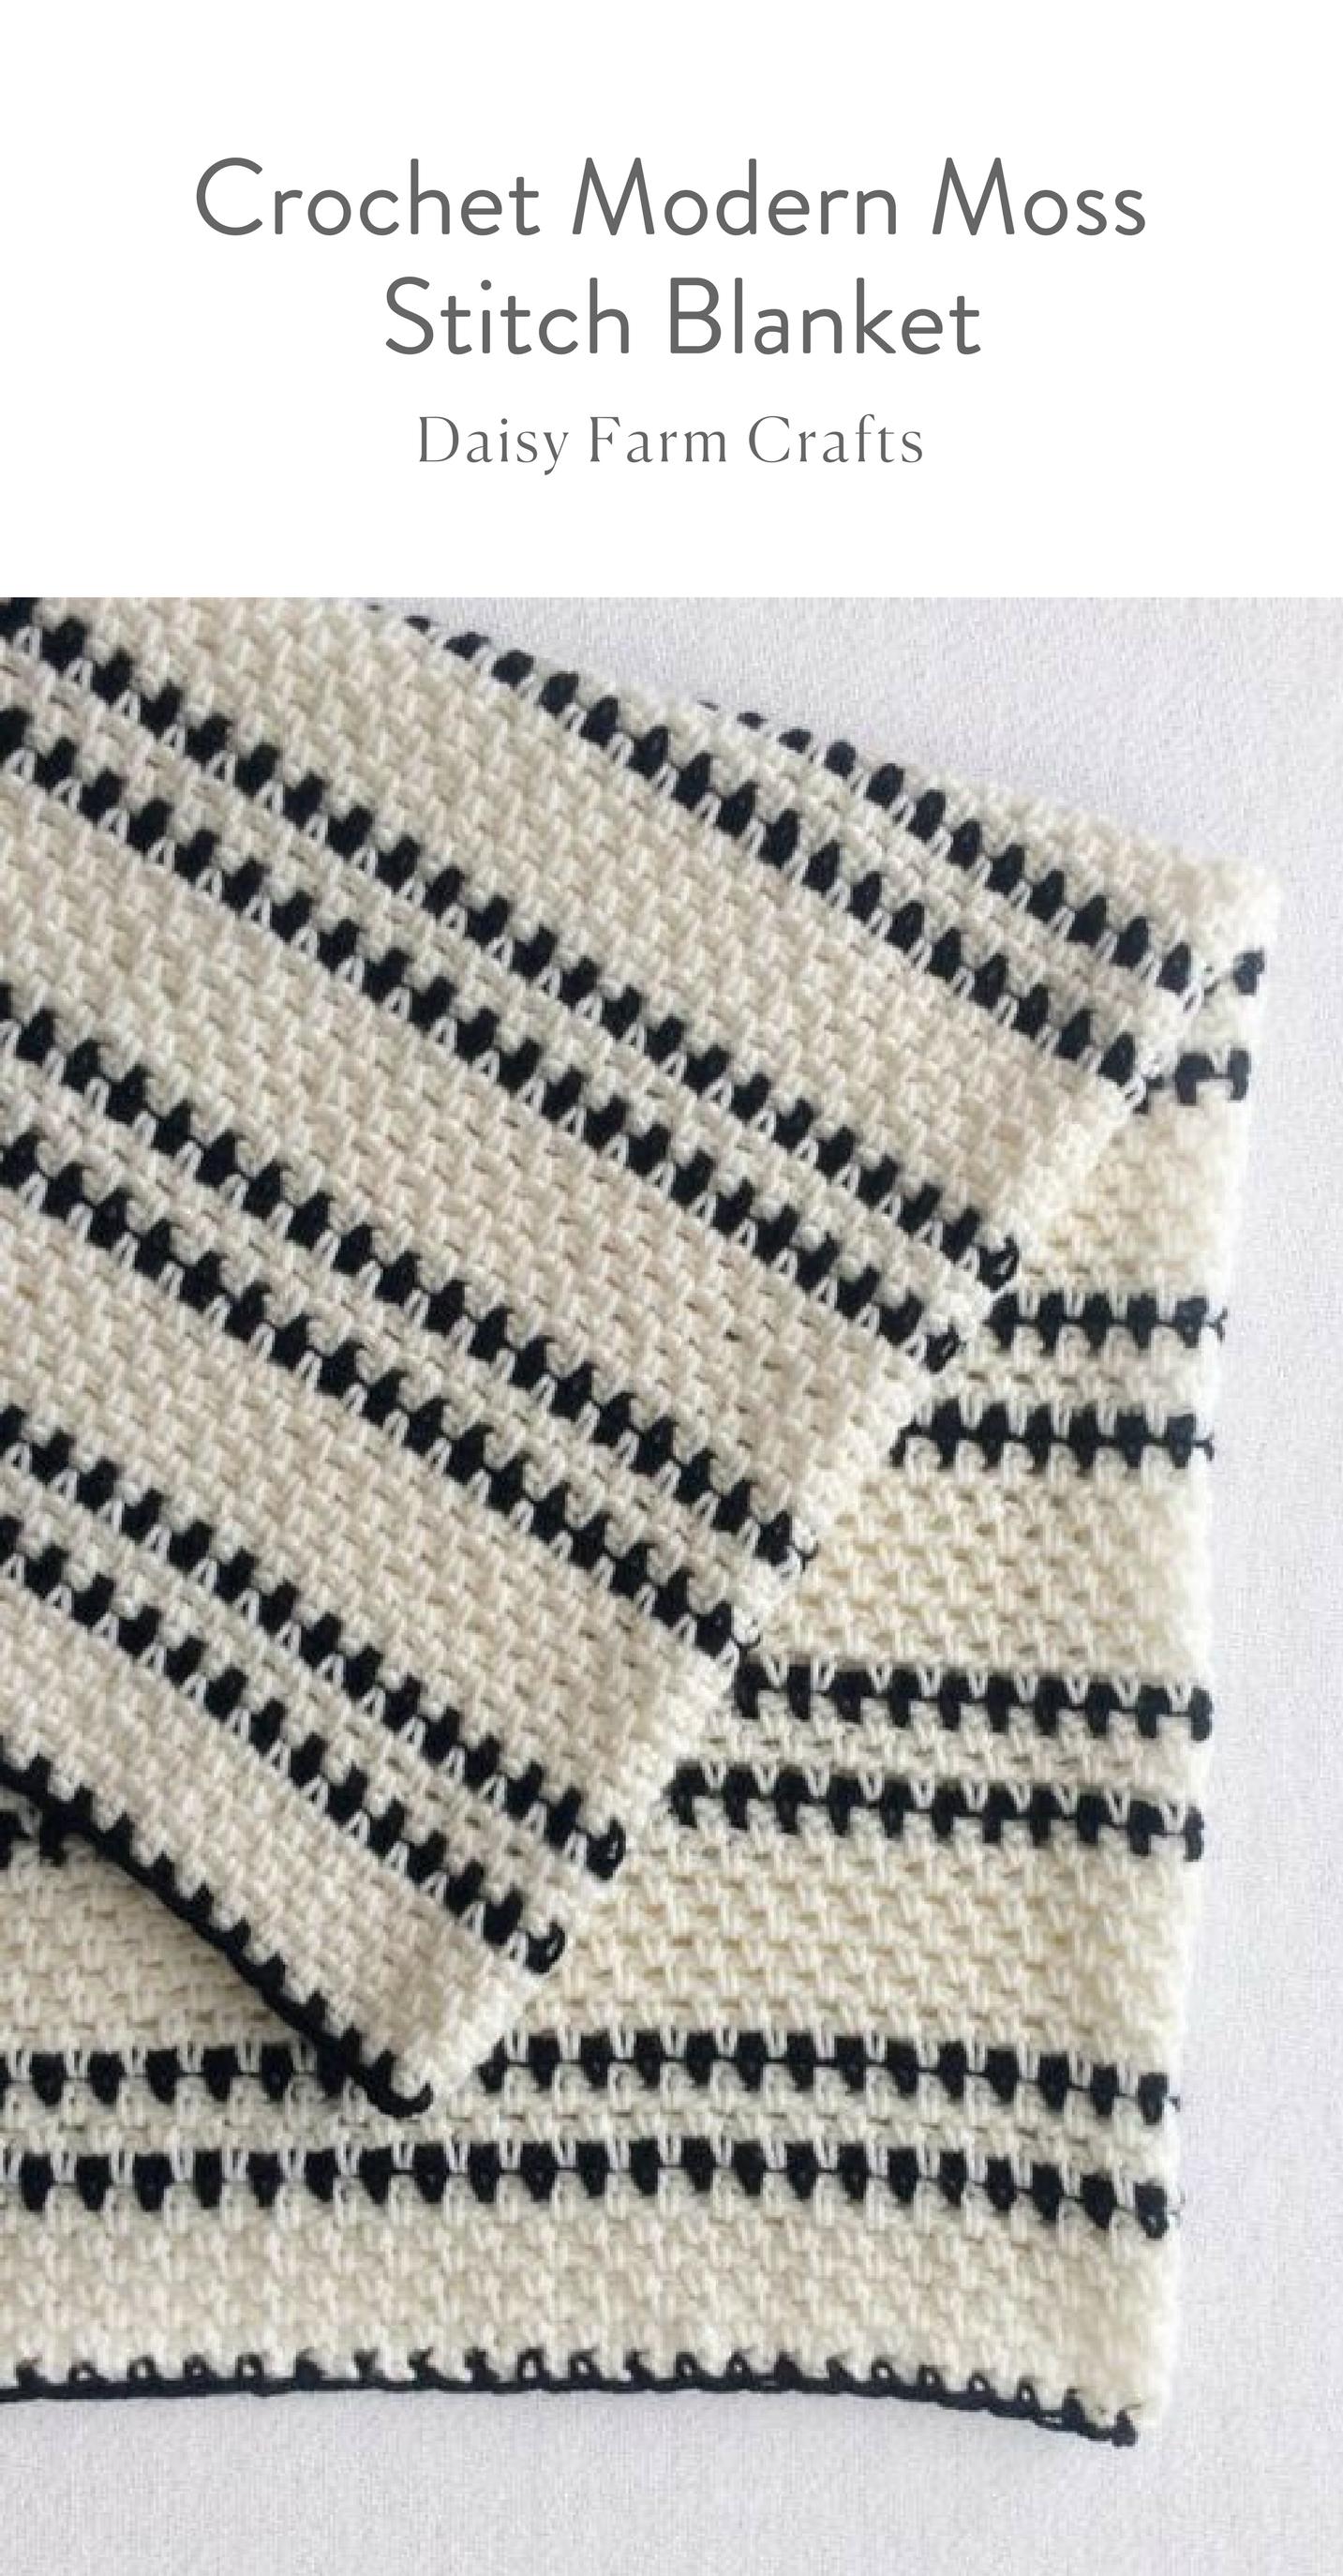 Free Pattern - Crochet Modern Moss Stitch Blanket | chicks with ...